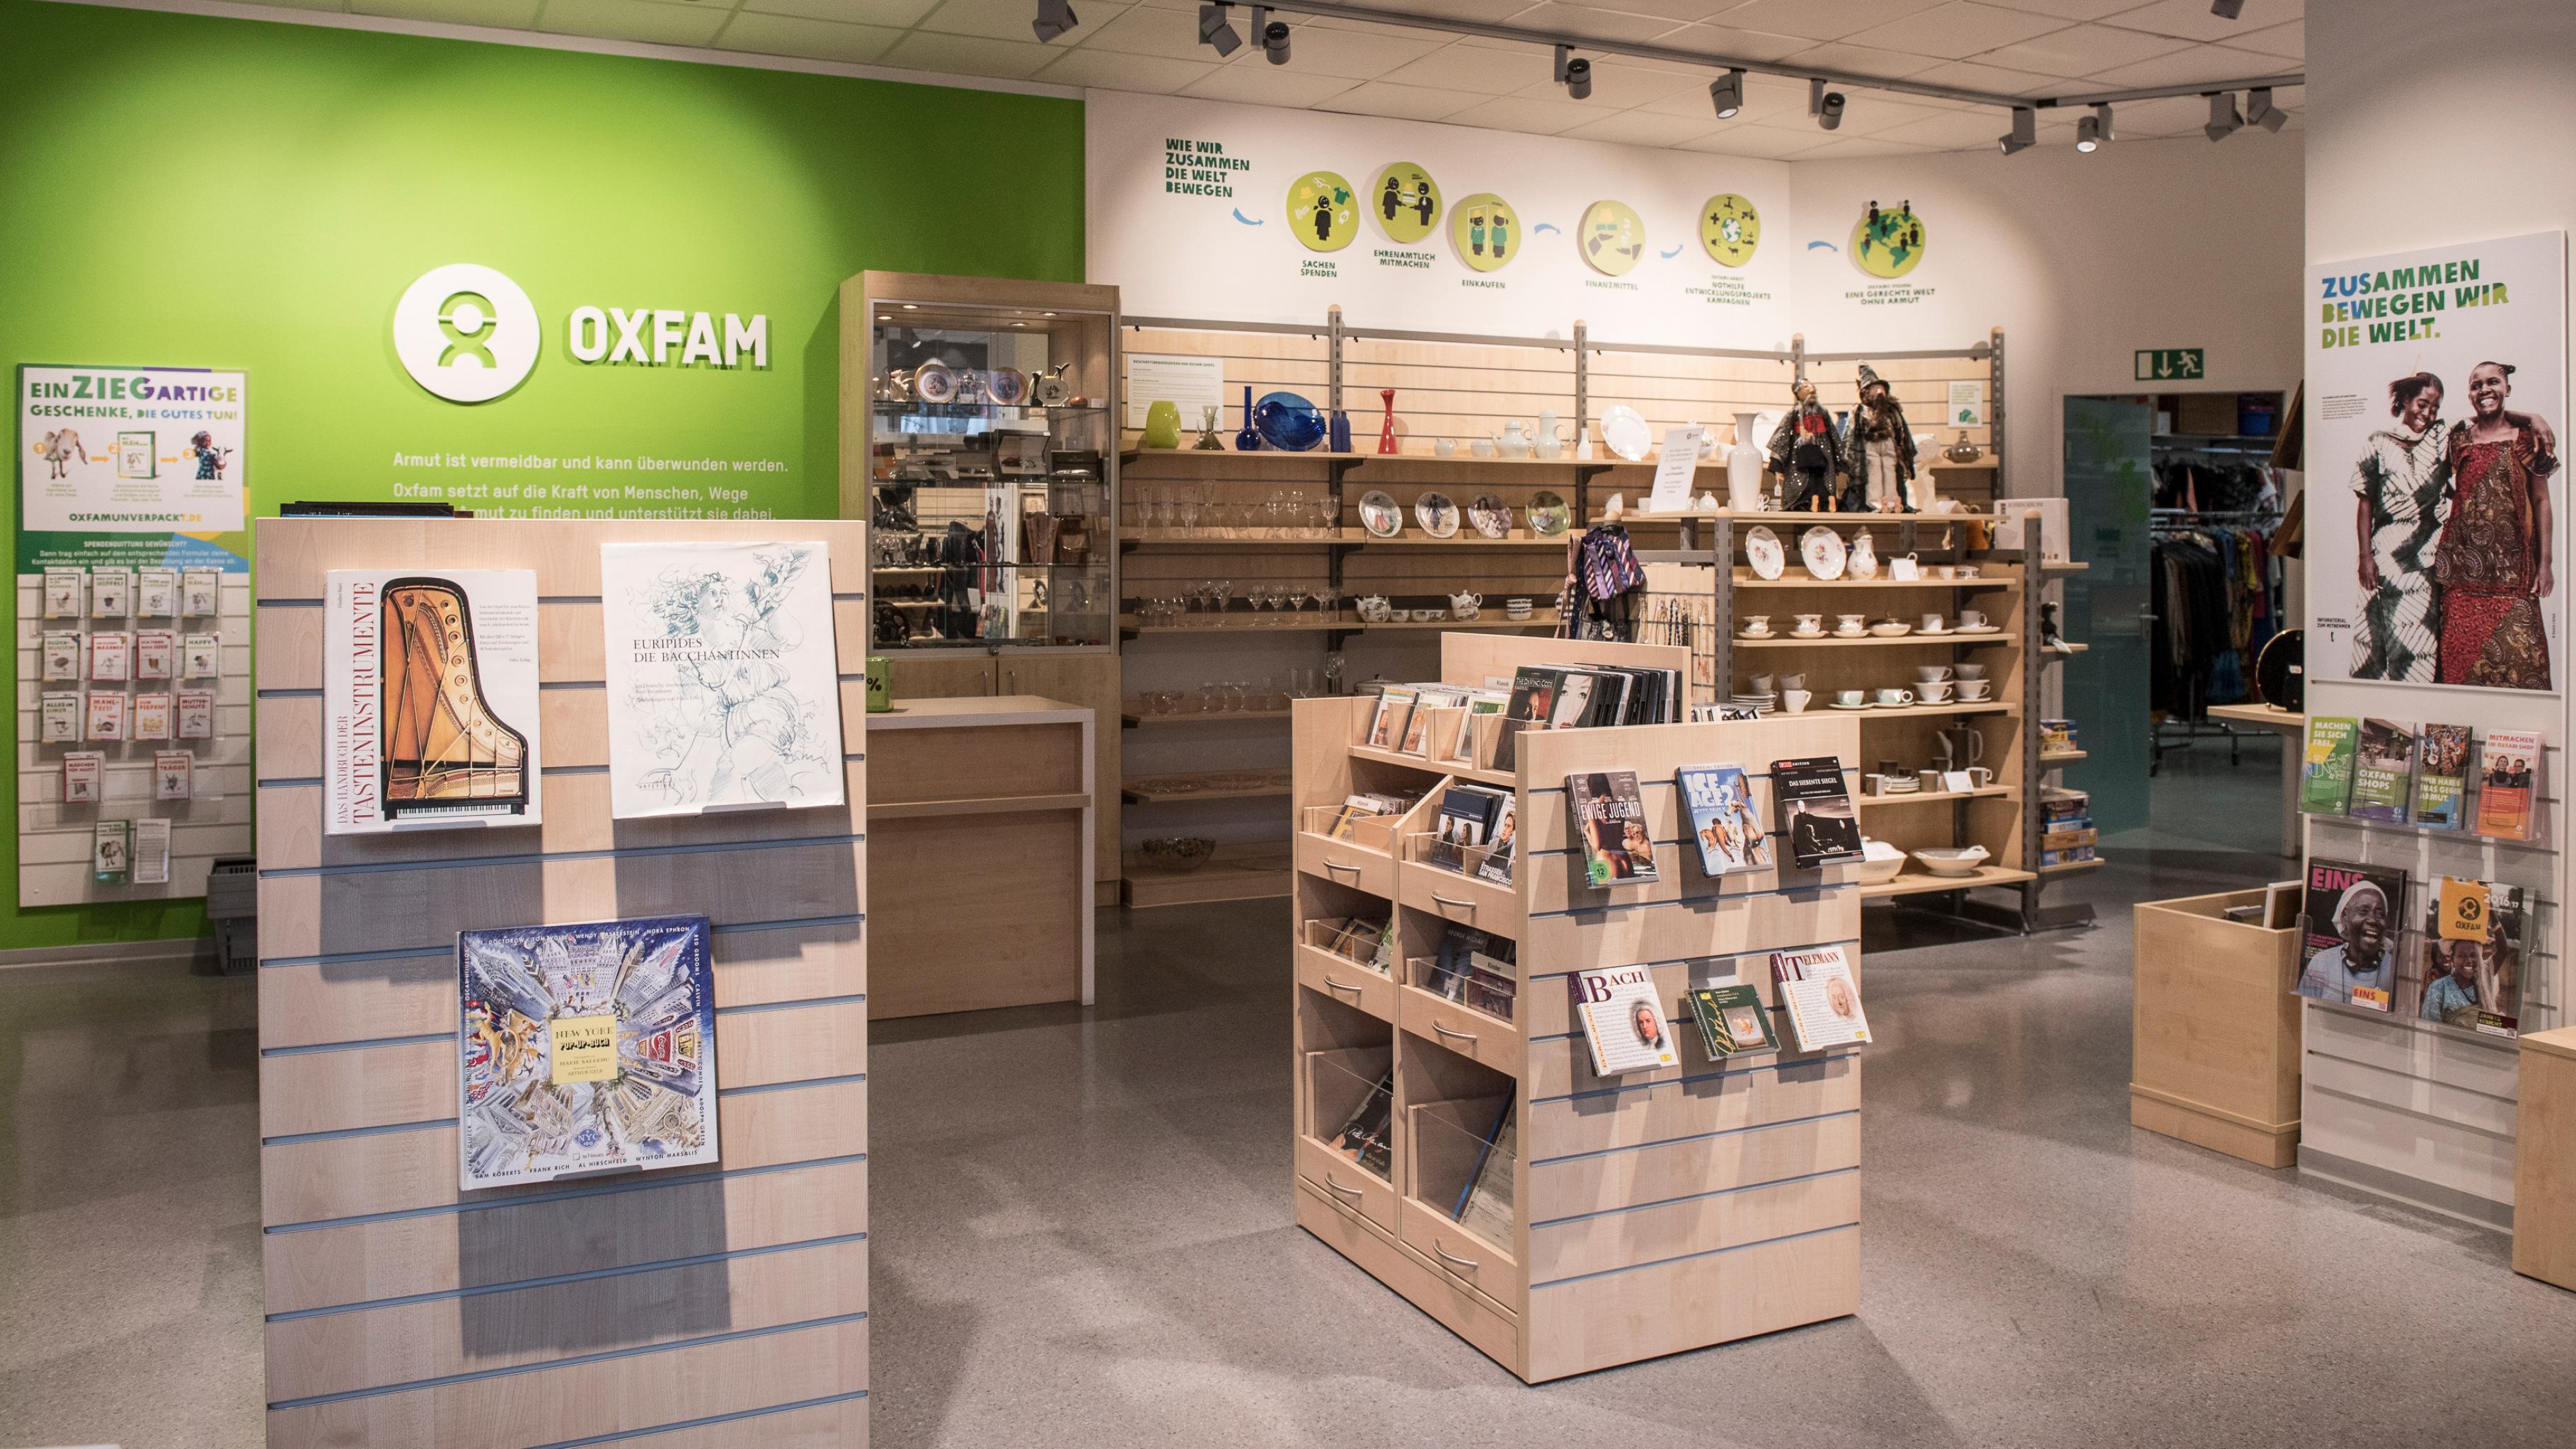 Oxfam Shop Nürnberg 2018 - Innenansicht